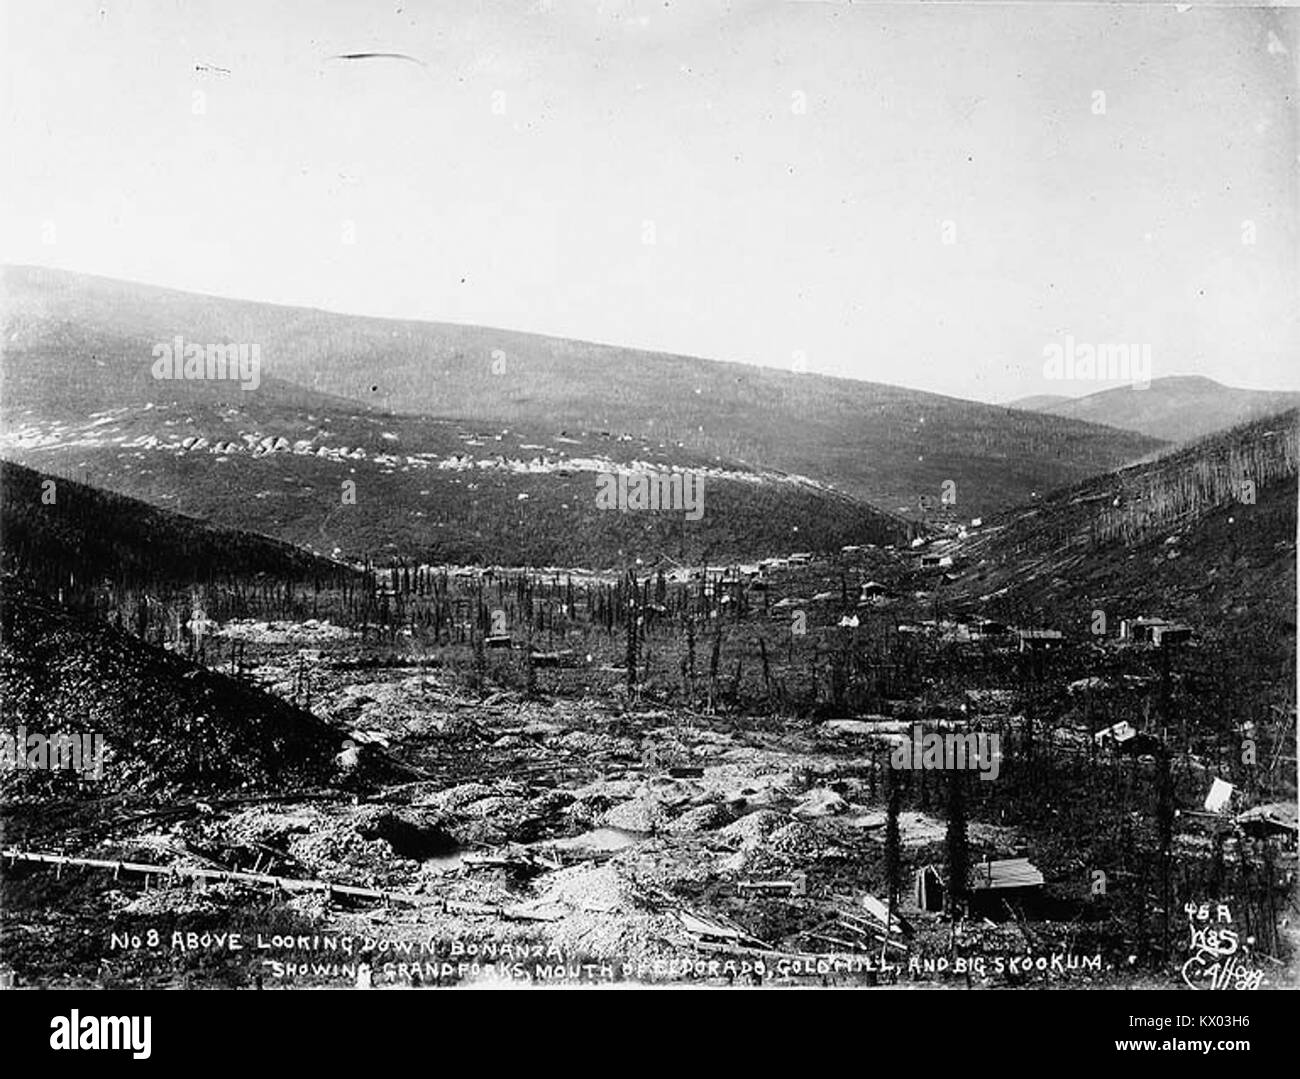 Mining claim No 8 above Bonanza Creek showing Grand Forks, mouth of Eldorado, Gold Hill, and Big Skookum, Yukon - Stock Image